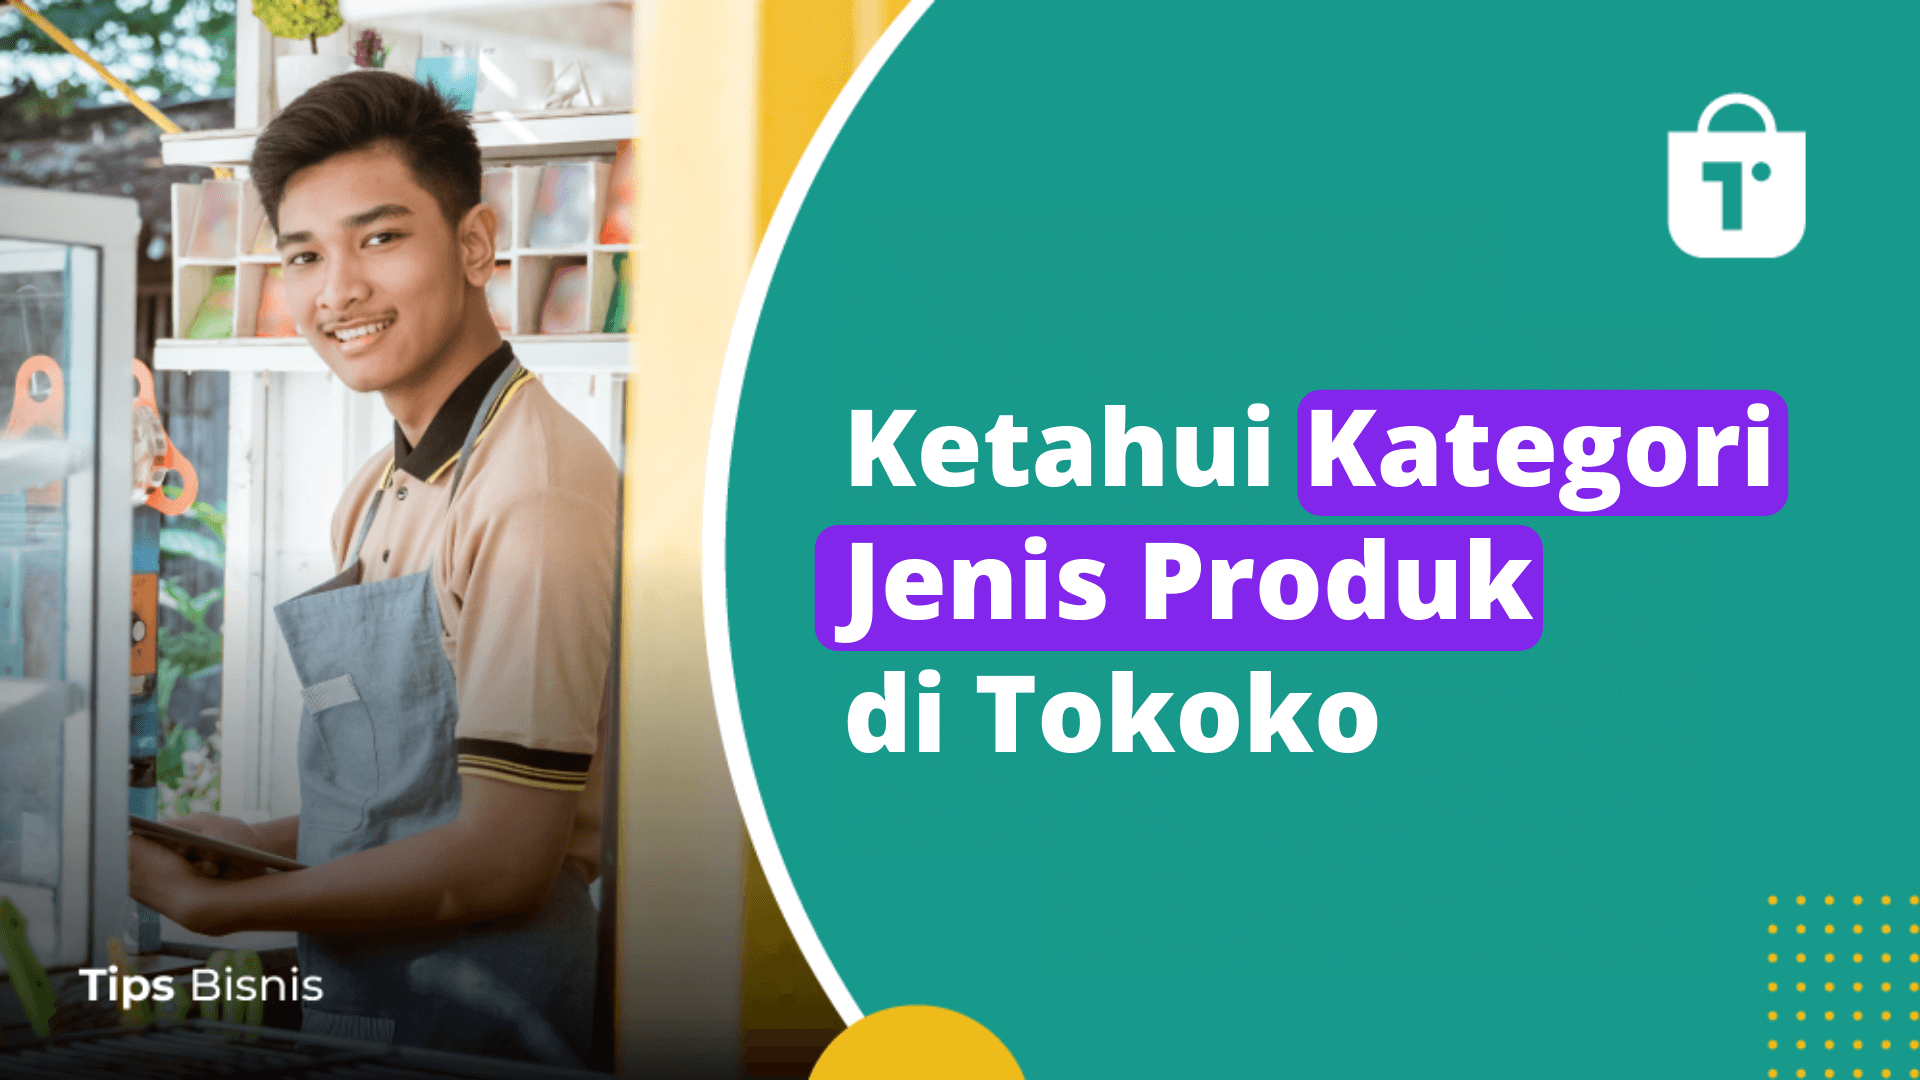 Ketahui Kategori Jenis Produk di Tokoko